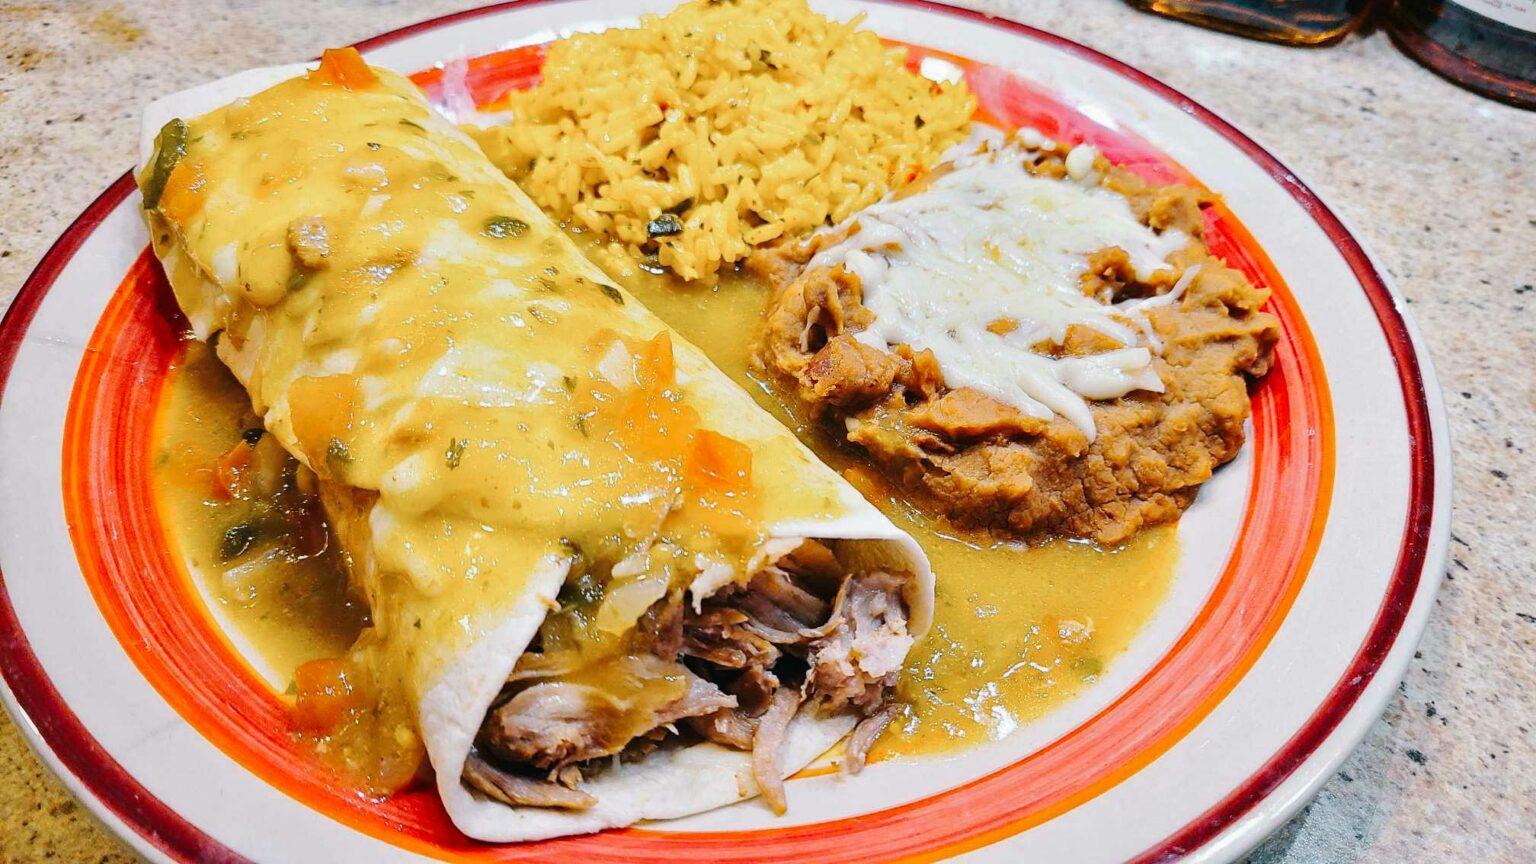 pork chili verde smothered burrito on a plate